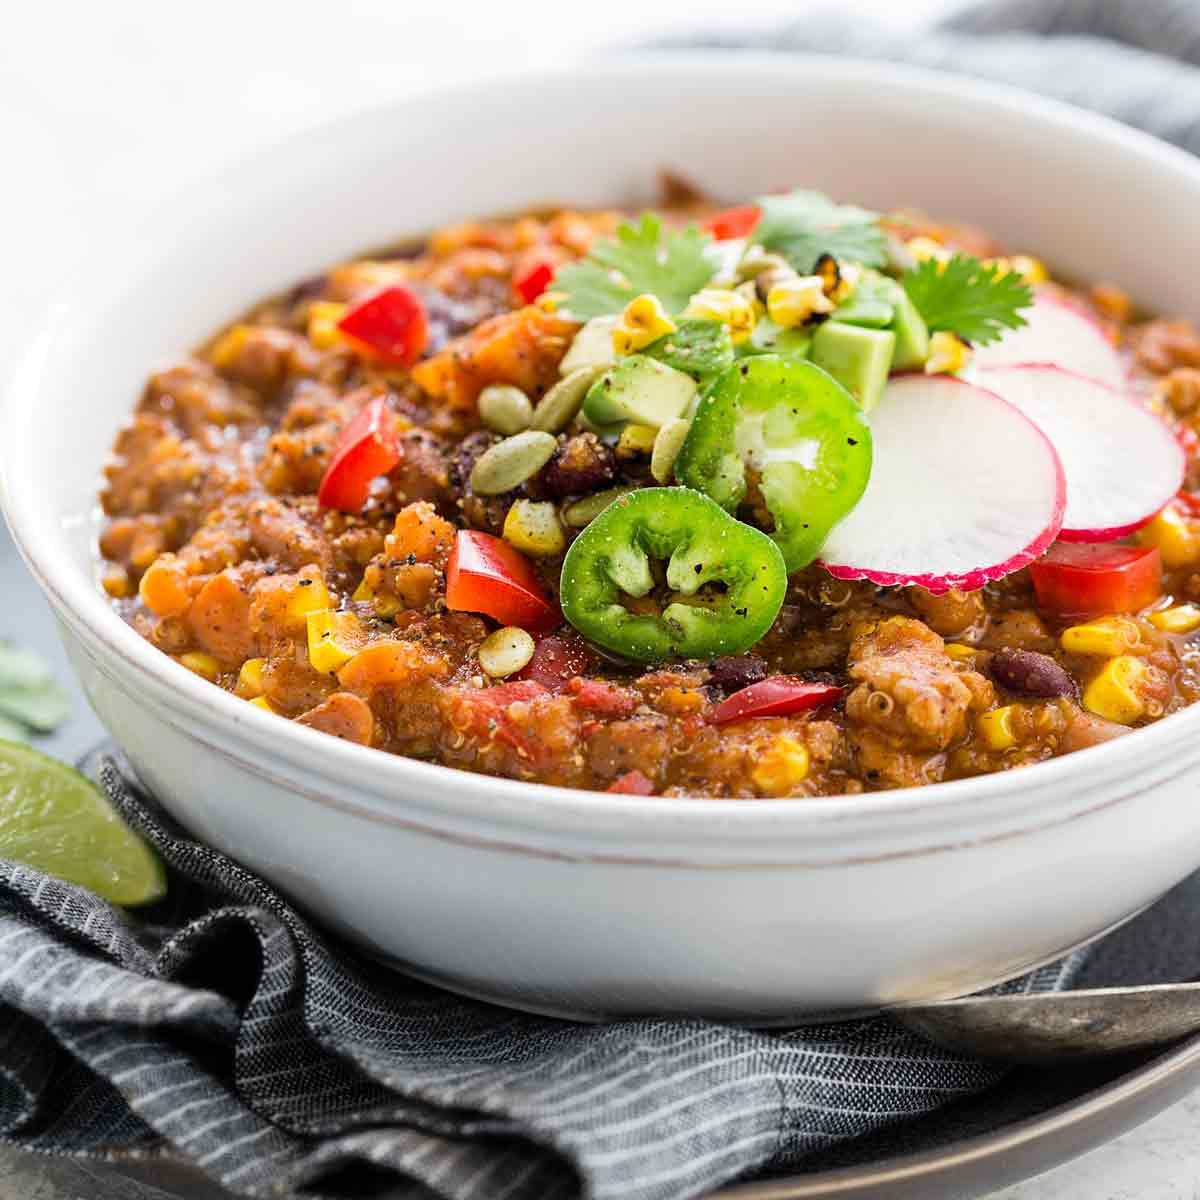 Instant Pot Turkey Chili  Instant Pot Turkey Chili with Quinoa